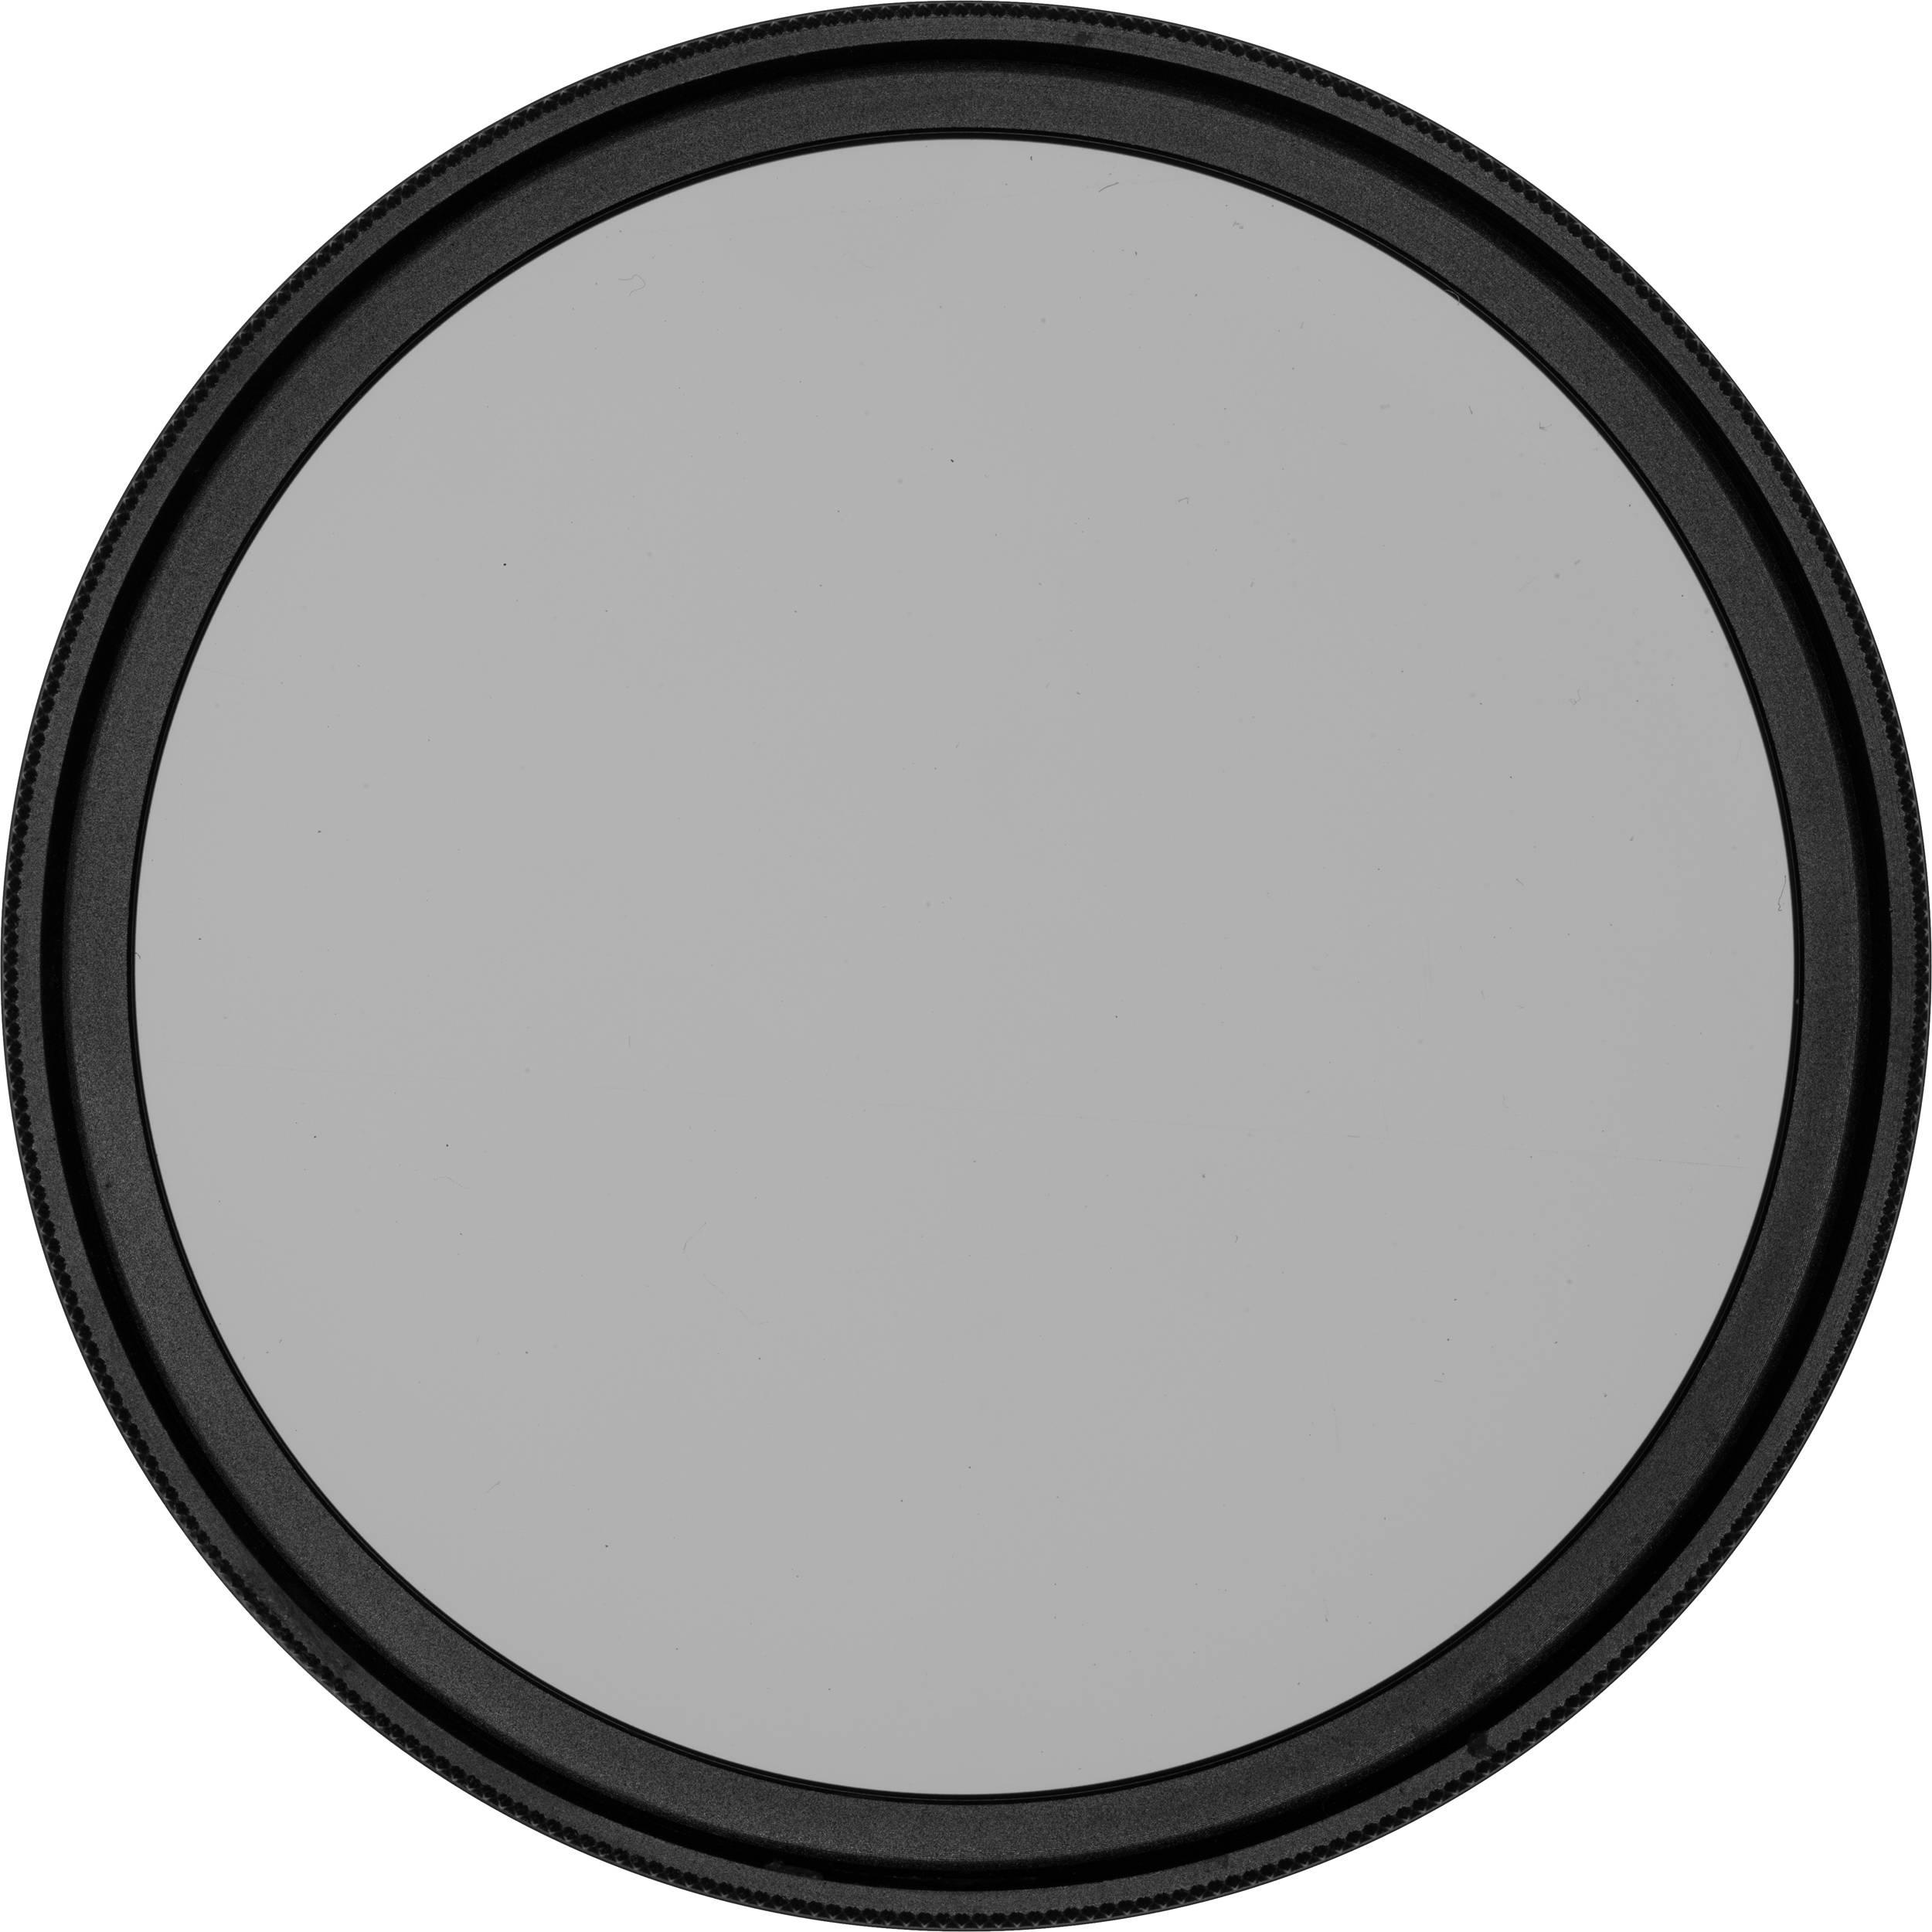 Vu Sion 37mm Slim Circular Polarizing Filter VSCPOL37